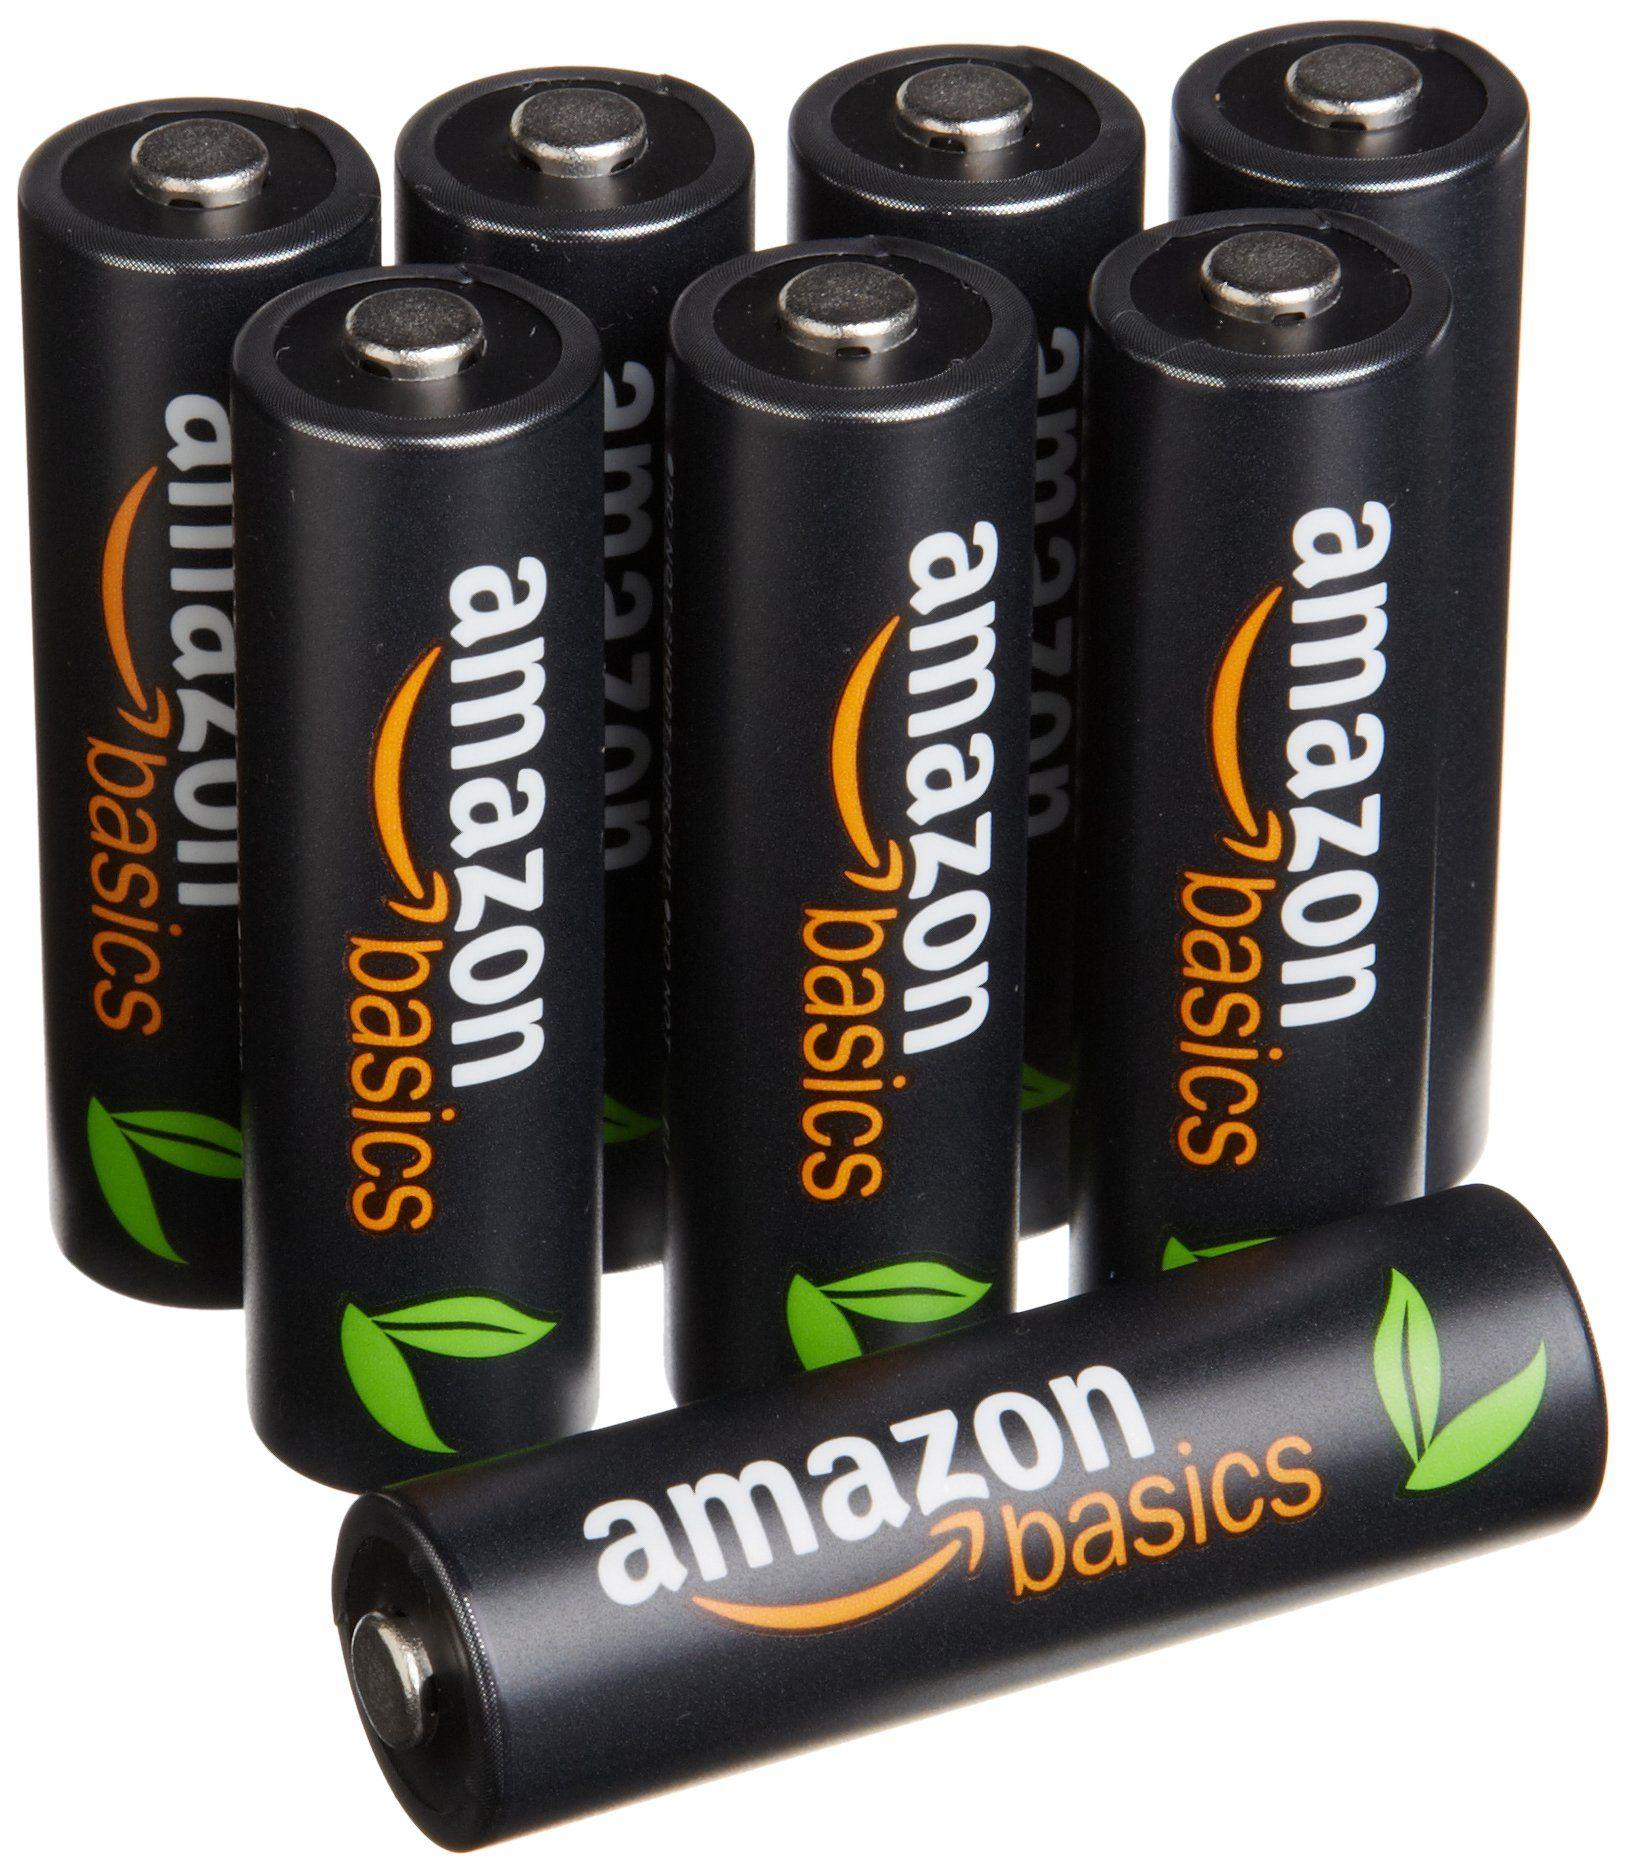 Amazonbasics Aa High Capacity Rechargeable Batteries 8 Pack Pre Charged Rechargeable Batteries Batteries Alkaline Battery